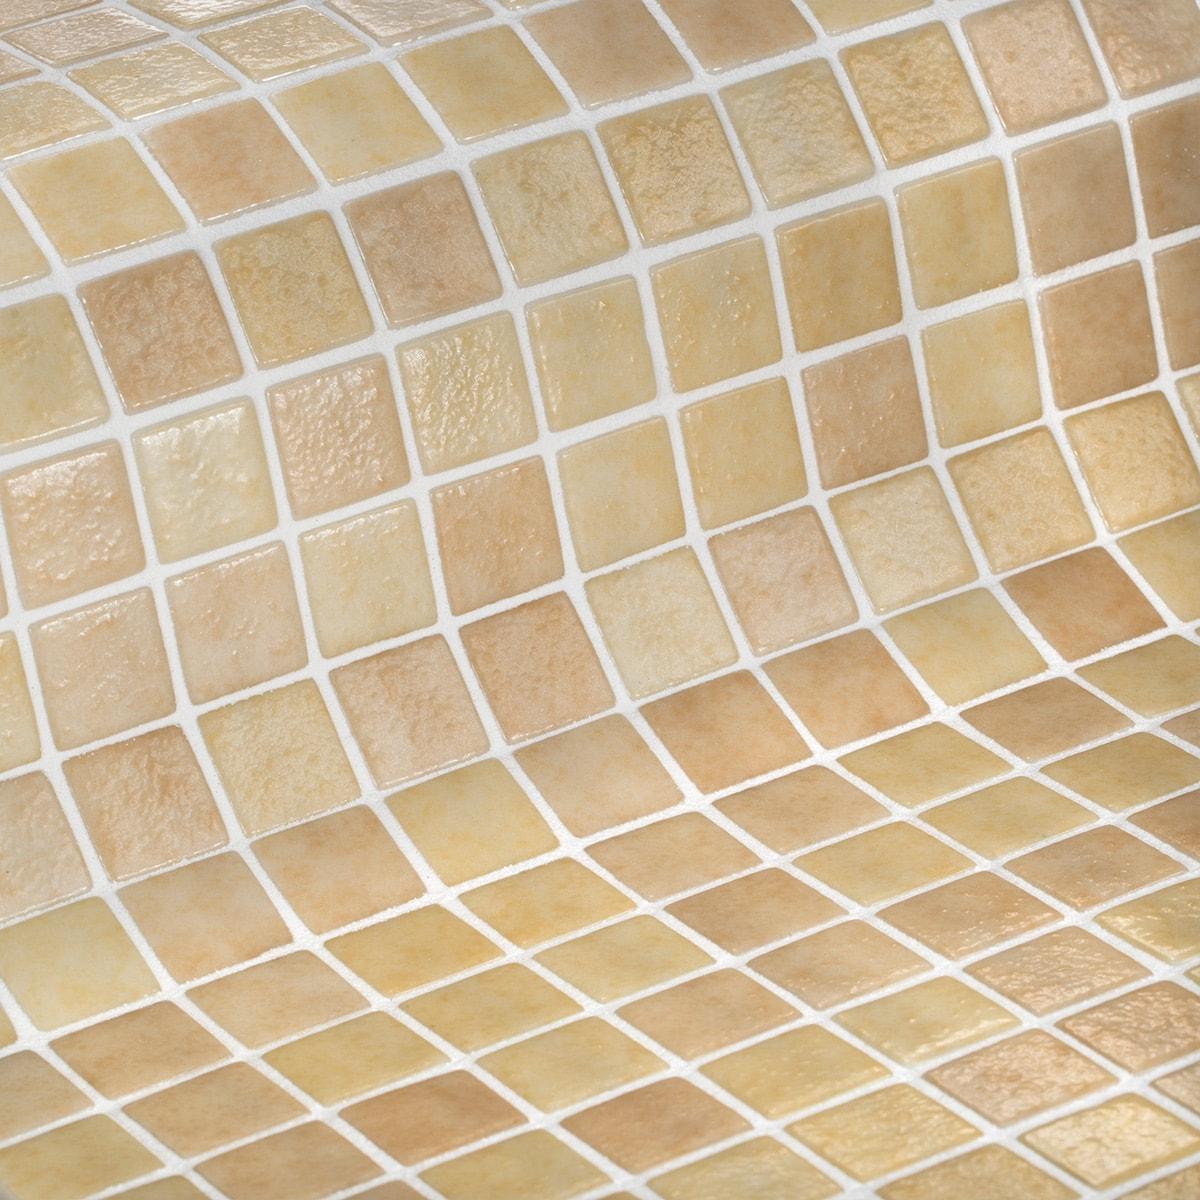 2576-B-Safe-Safe-steps-Mosaic-Ezarri.jpg